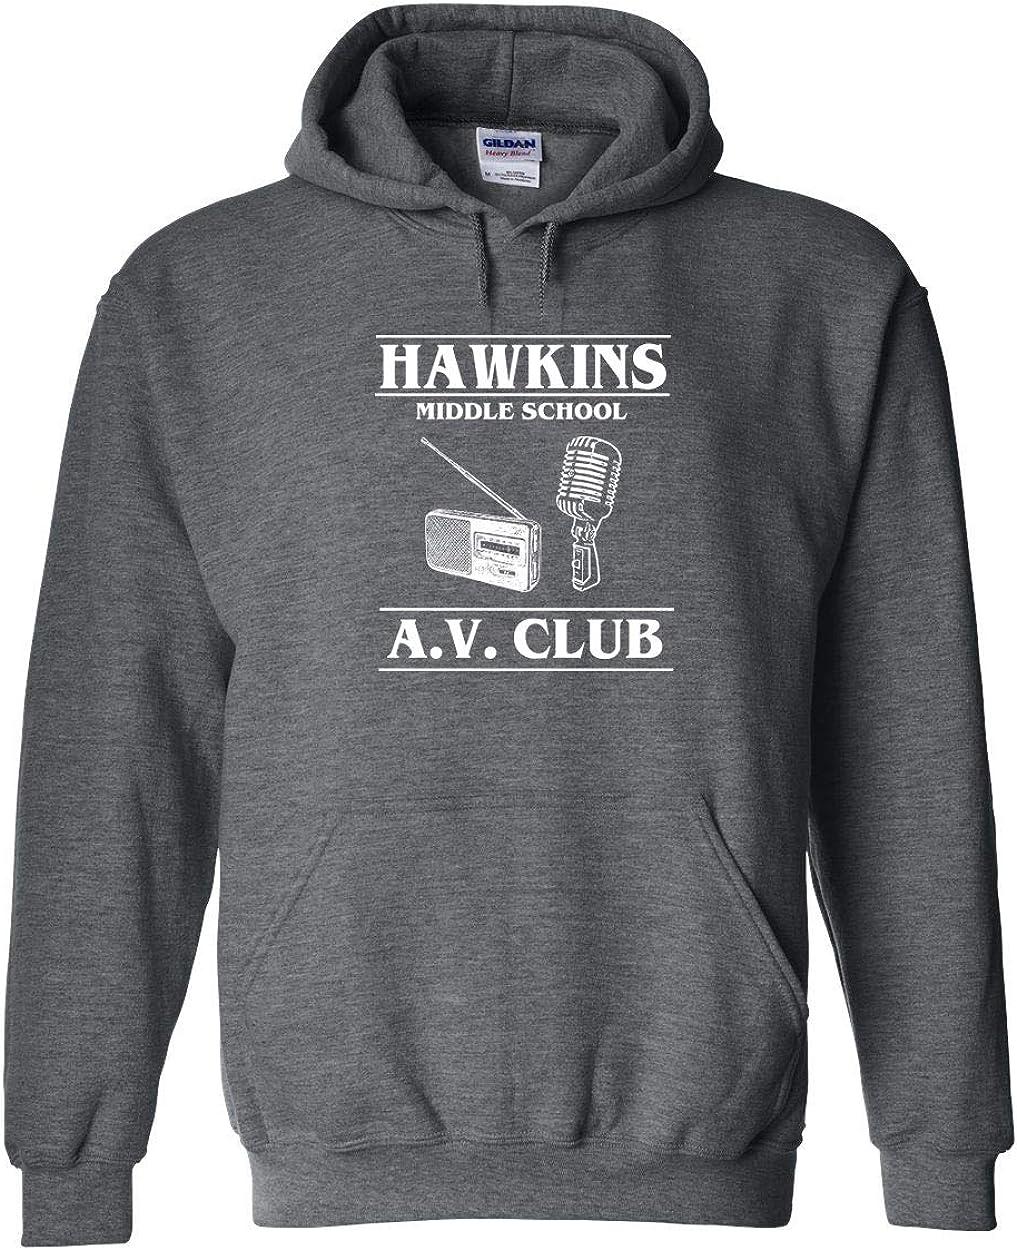 Club Funny Hooded Sweatshirt Swaffy Tees 538 Hawkins A.V